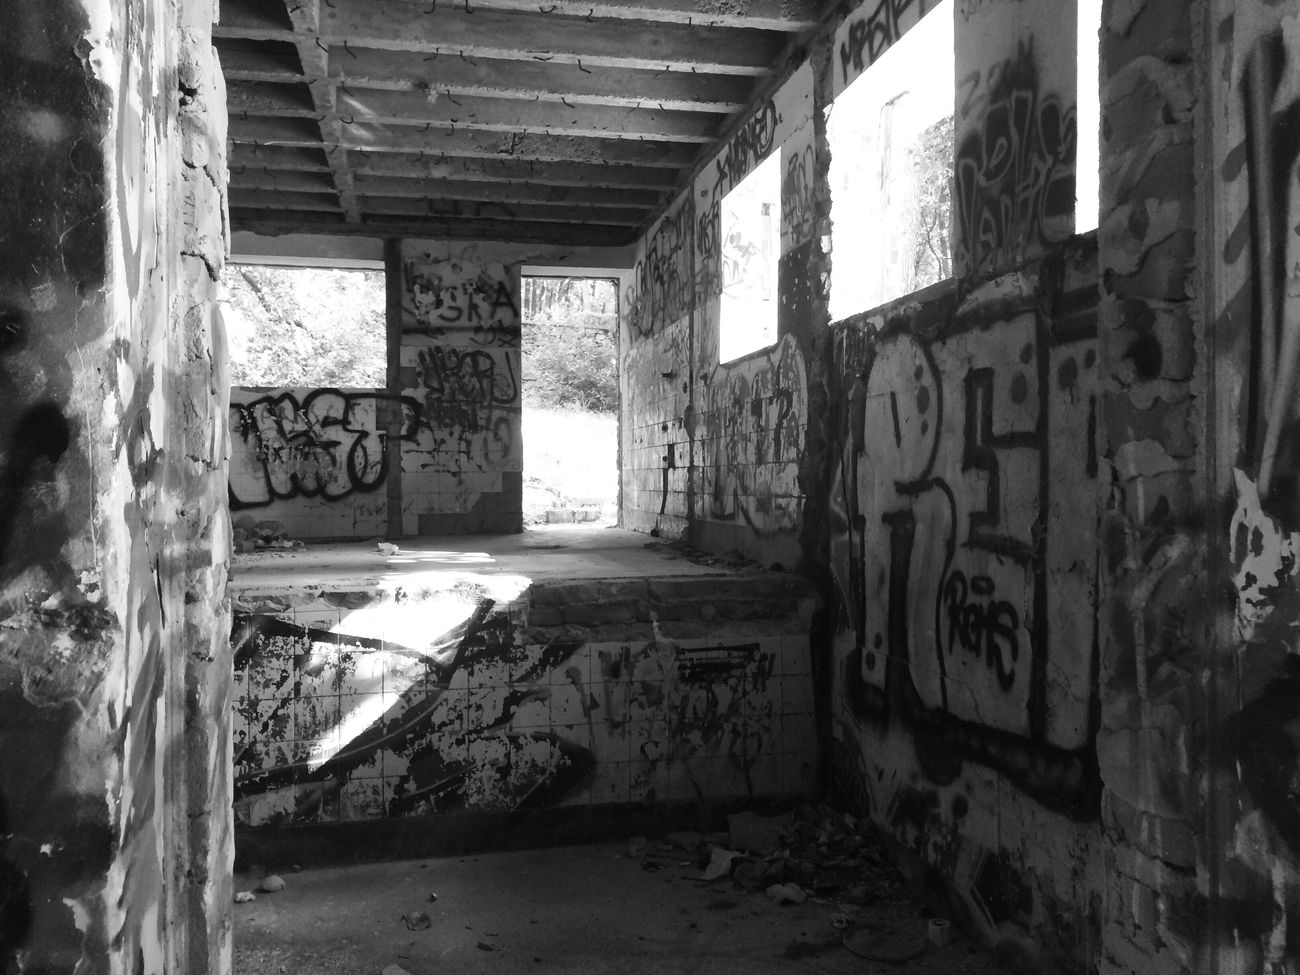 Graffiti Art Artgrafitti  Croatia Blackandwhite Black & White Bestoftheday Bestpicoftheday Hollidays Nopeople Like4like Croatia ♡ Best  Handyphoto Handy Photo Picture